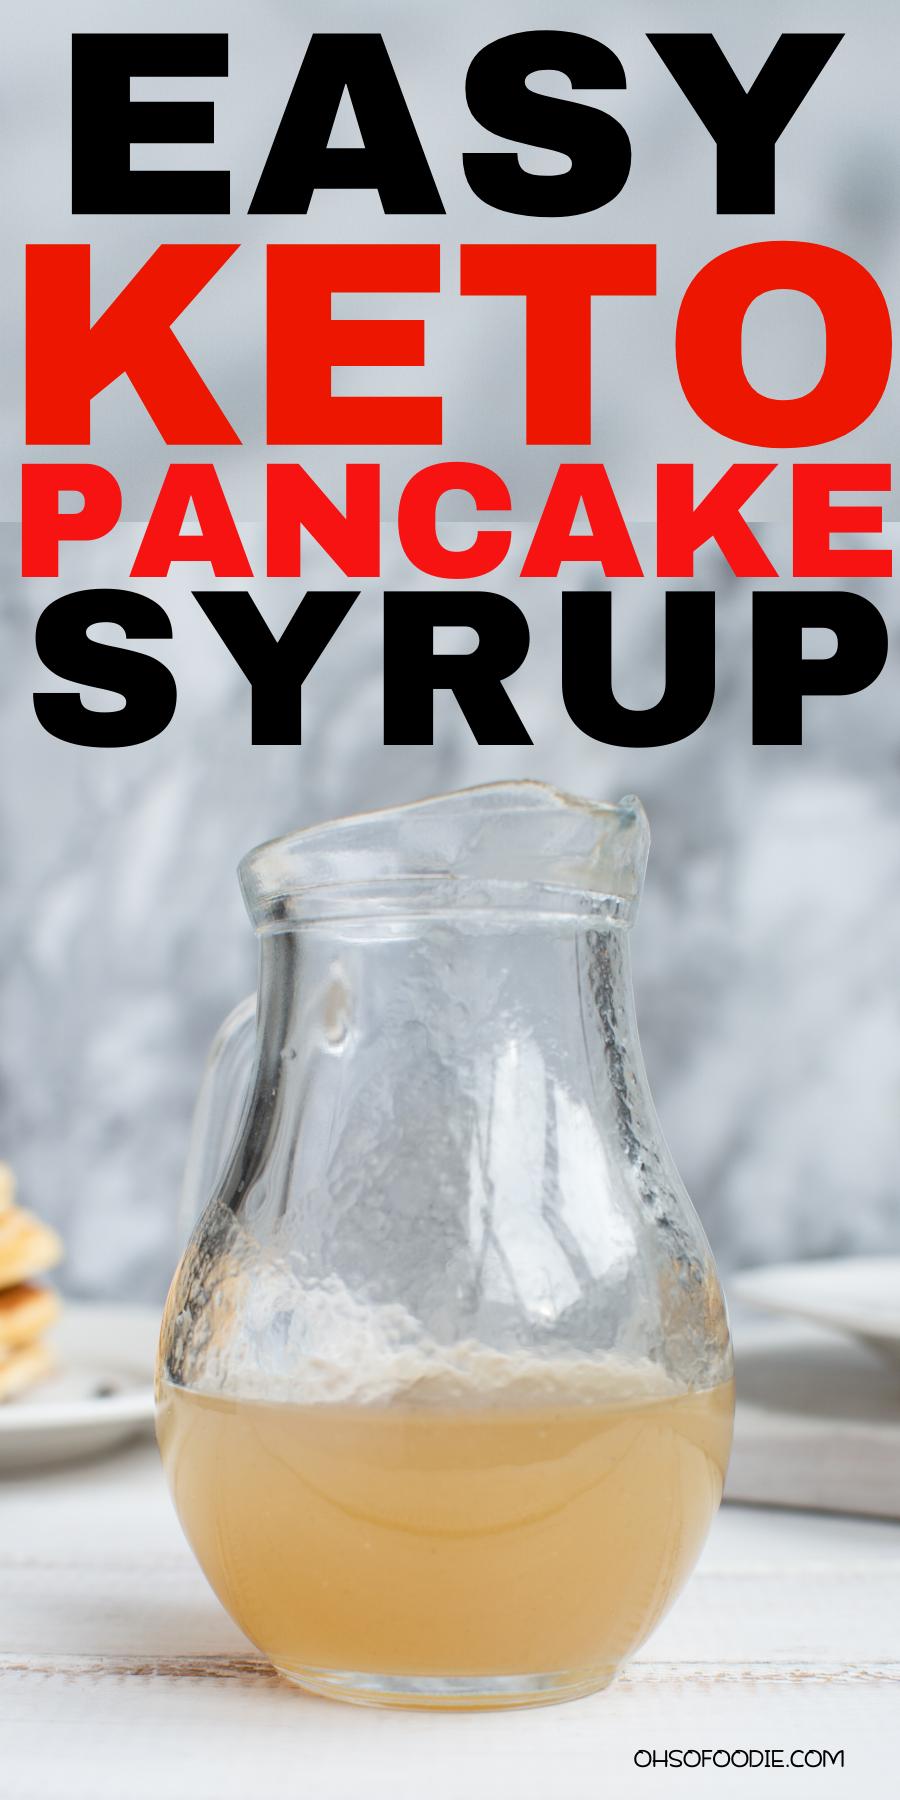 Easy keto pancake syrup